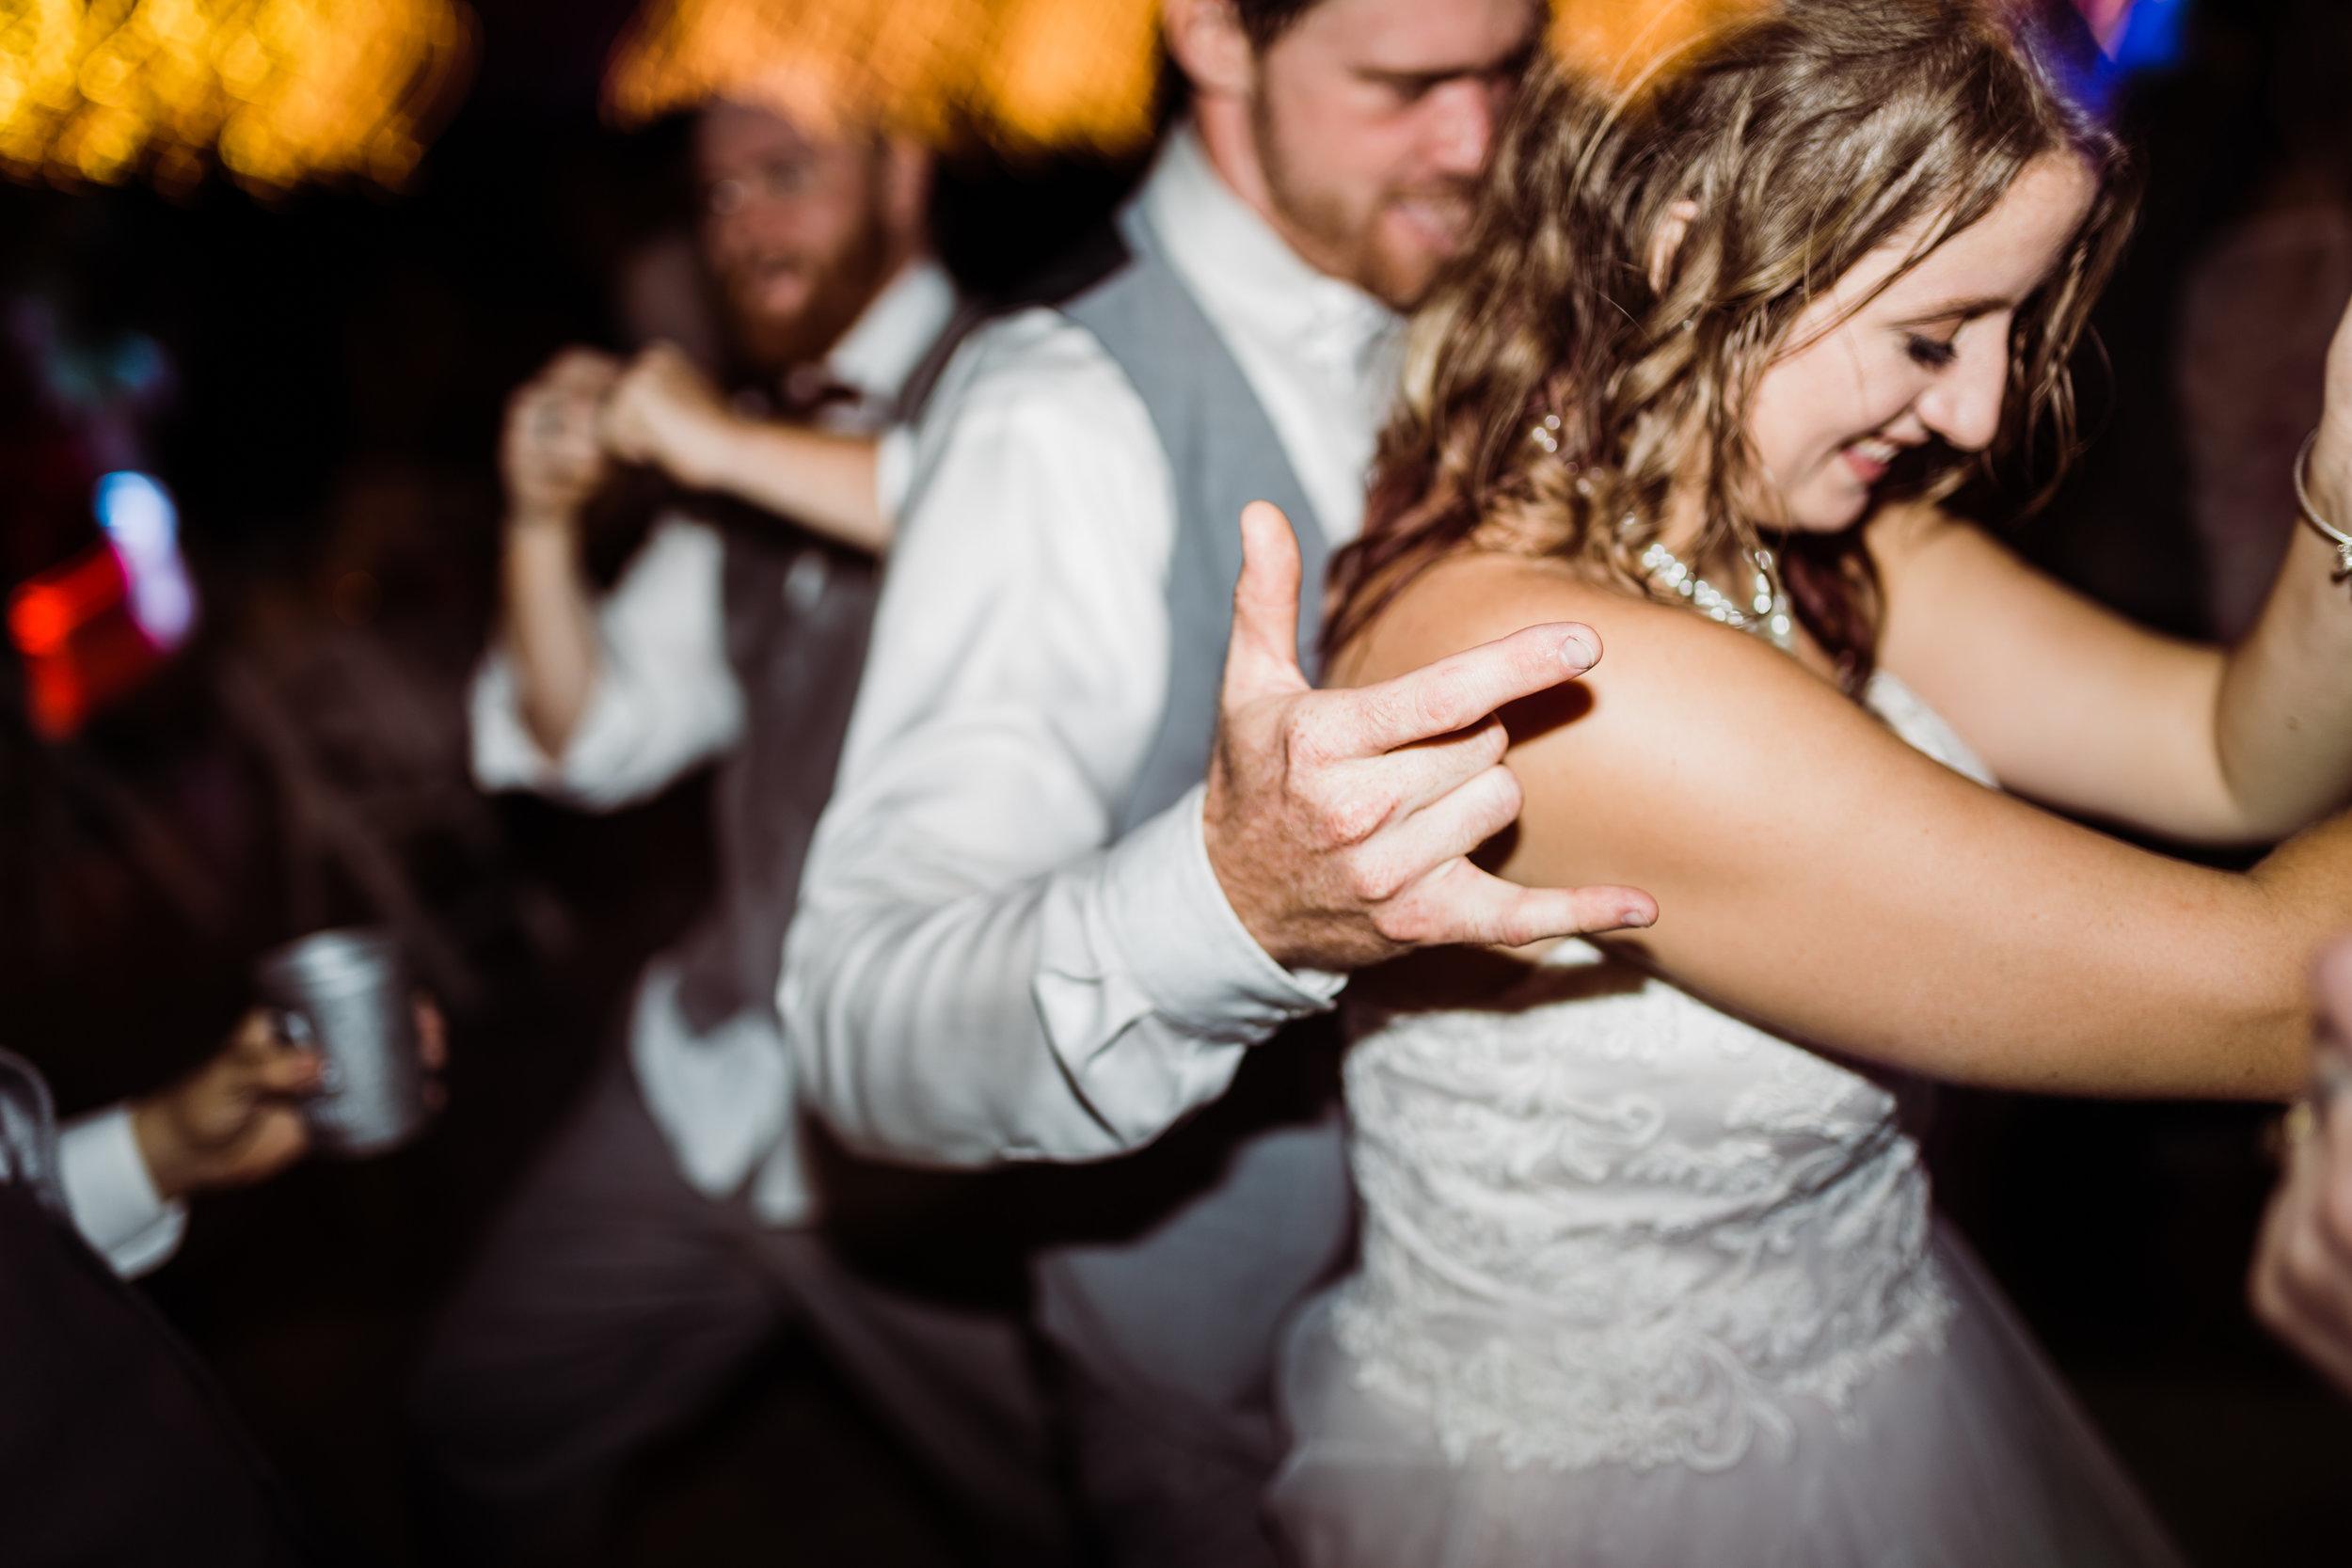 2017.10.14 Samantha and Matthew Crabtree Sarasota Wedding (635 of 708).jpg